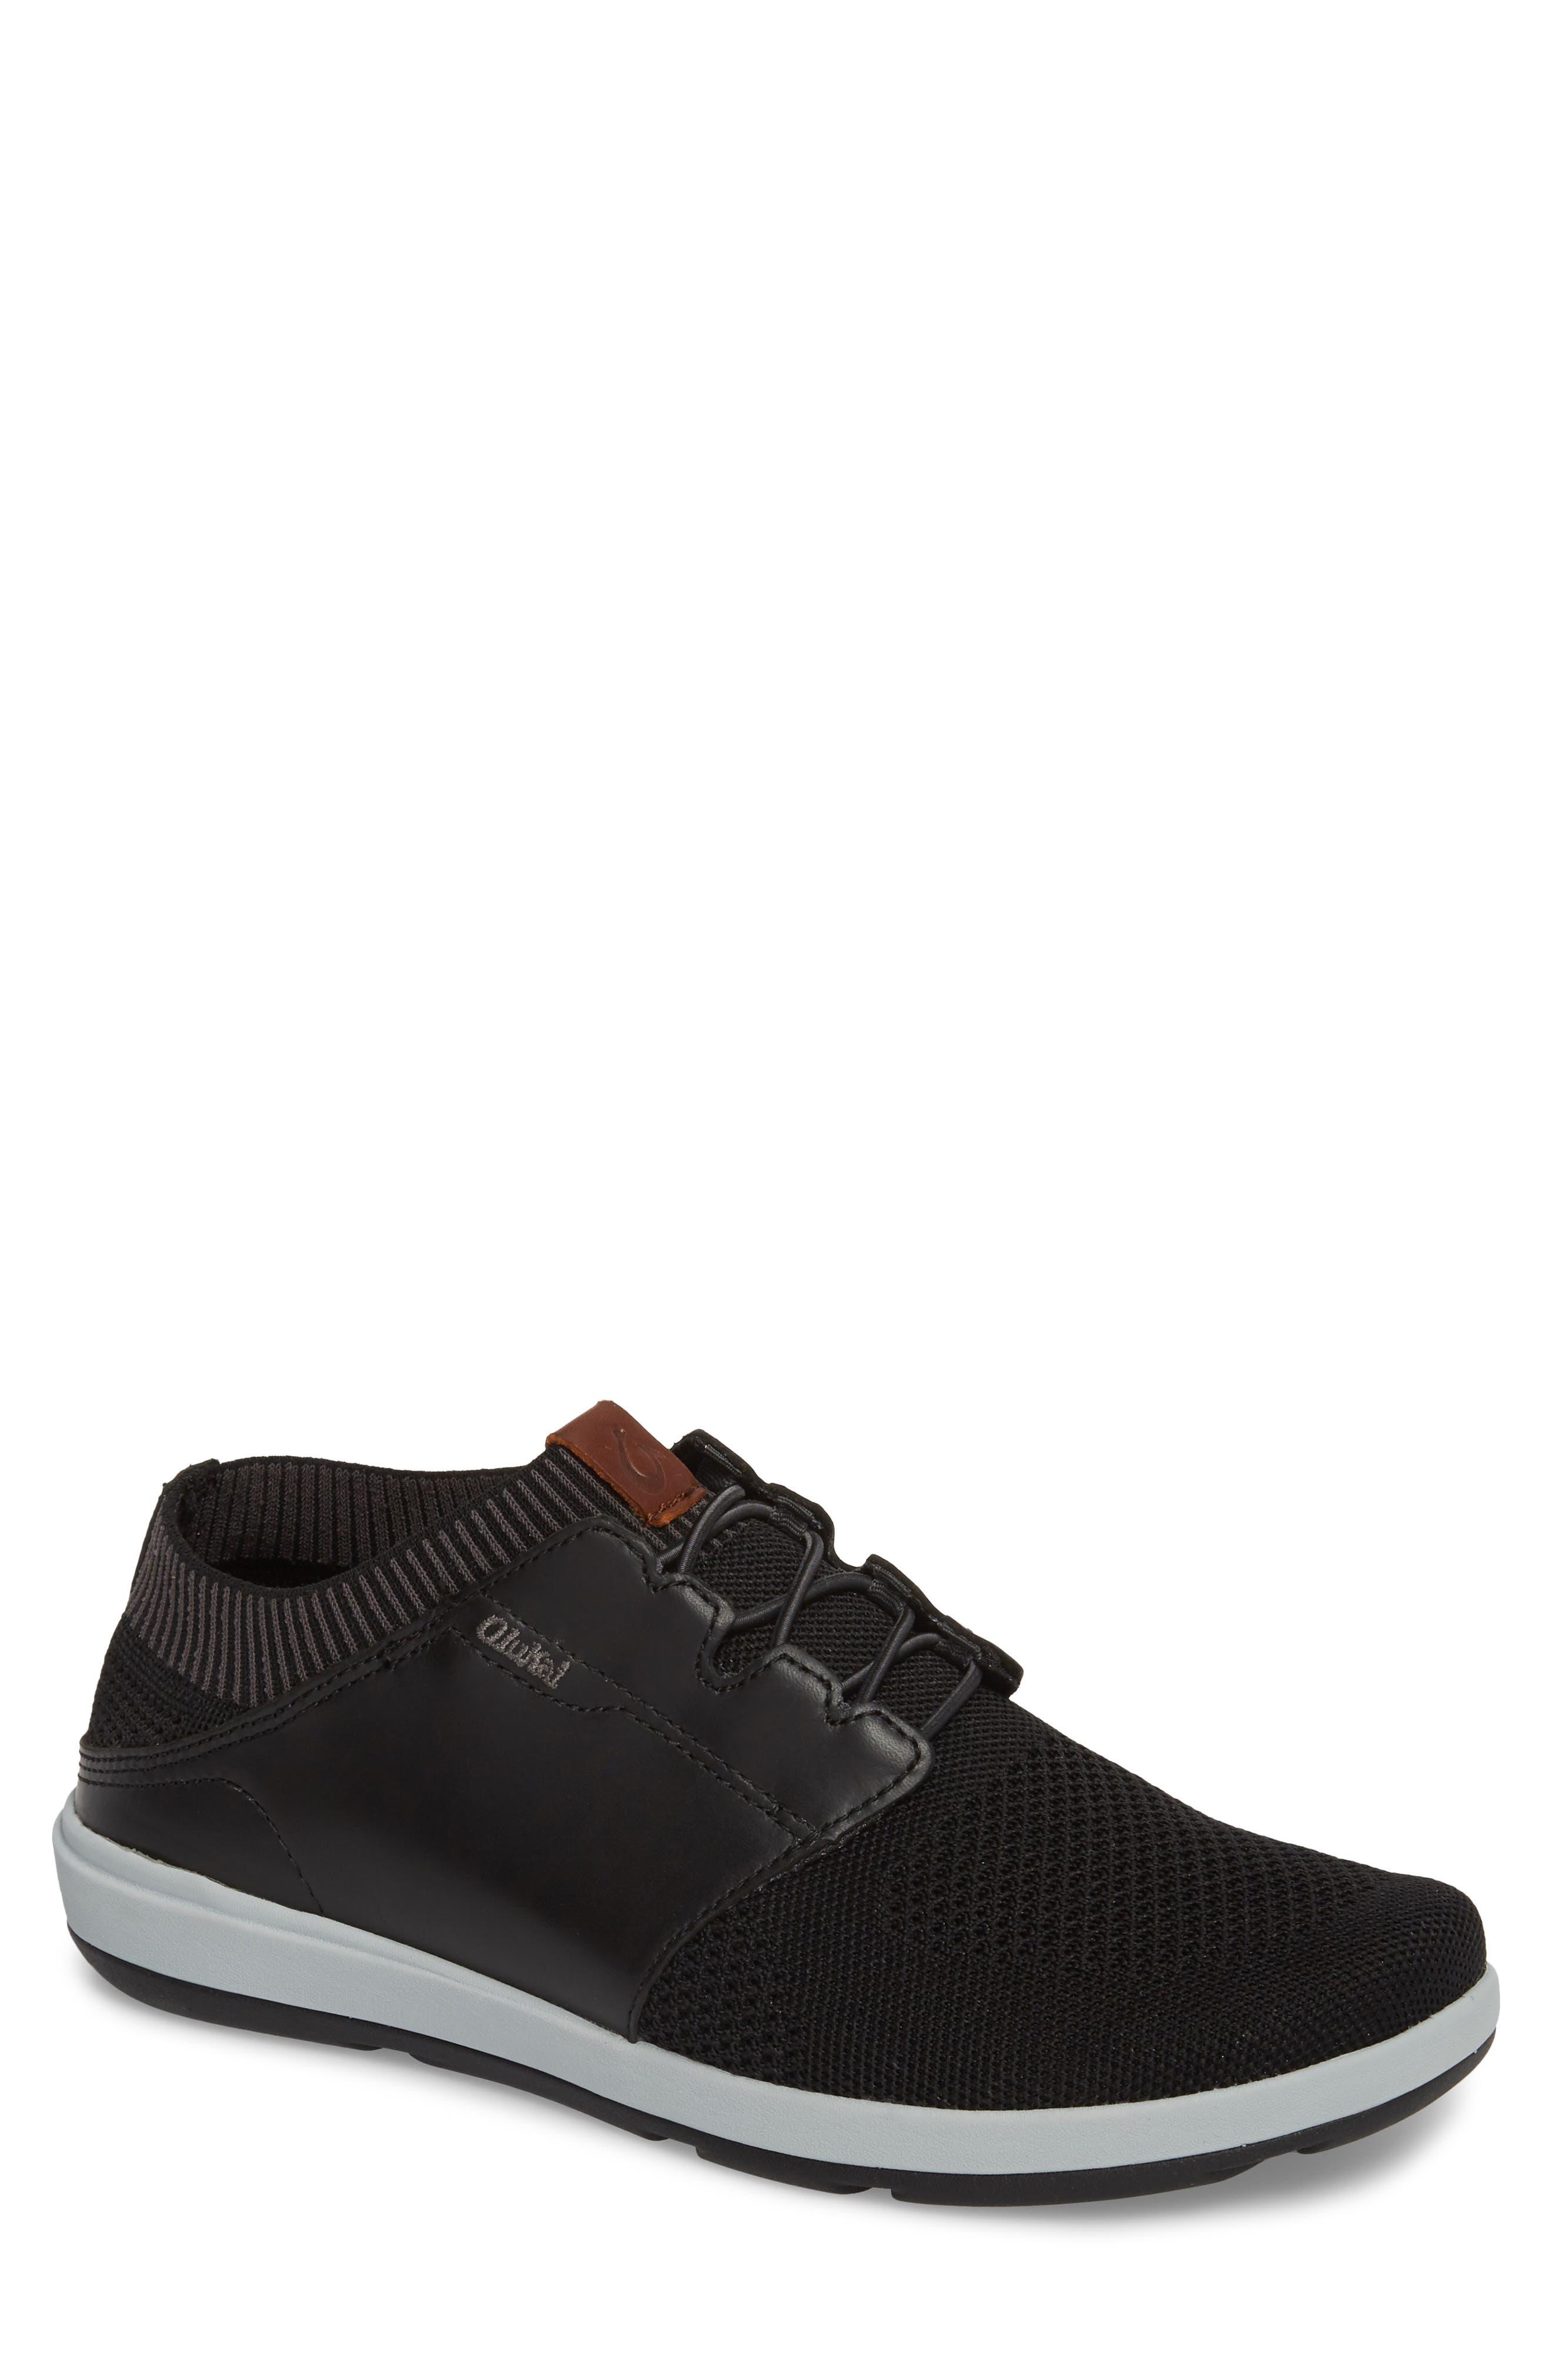 Makia Ulana Sneaker,                             Main thumbnail 1, color,                             BLACK/ BLACK